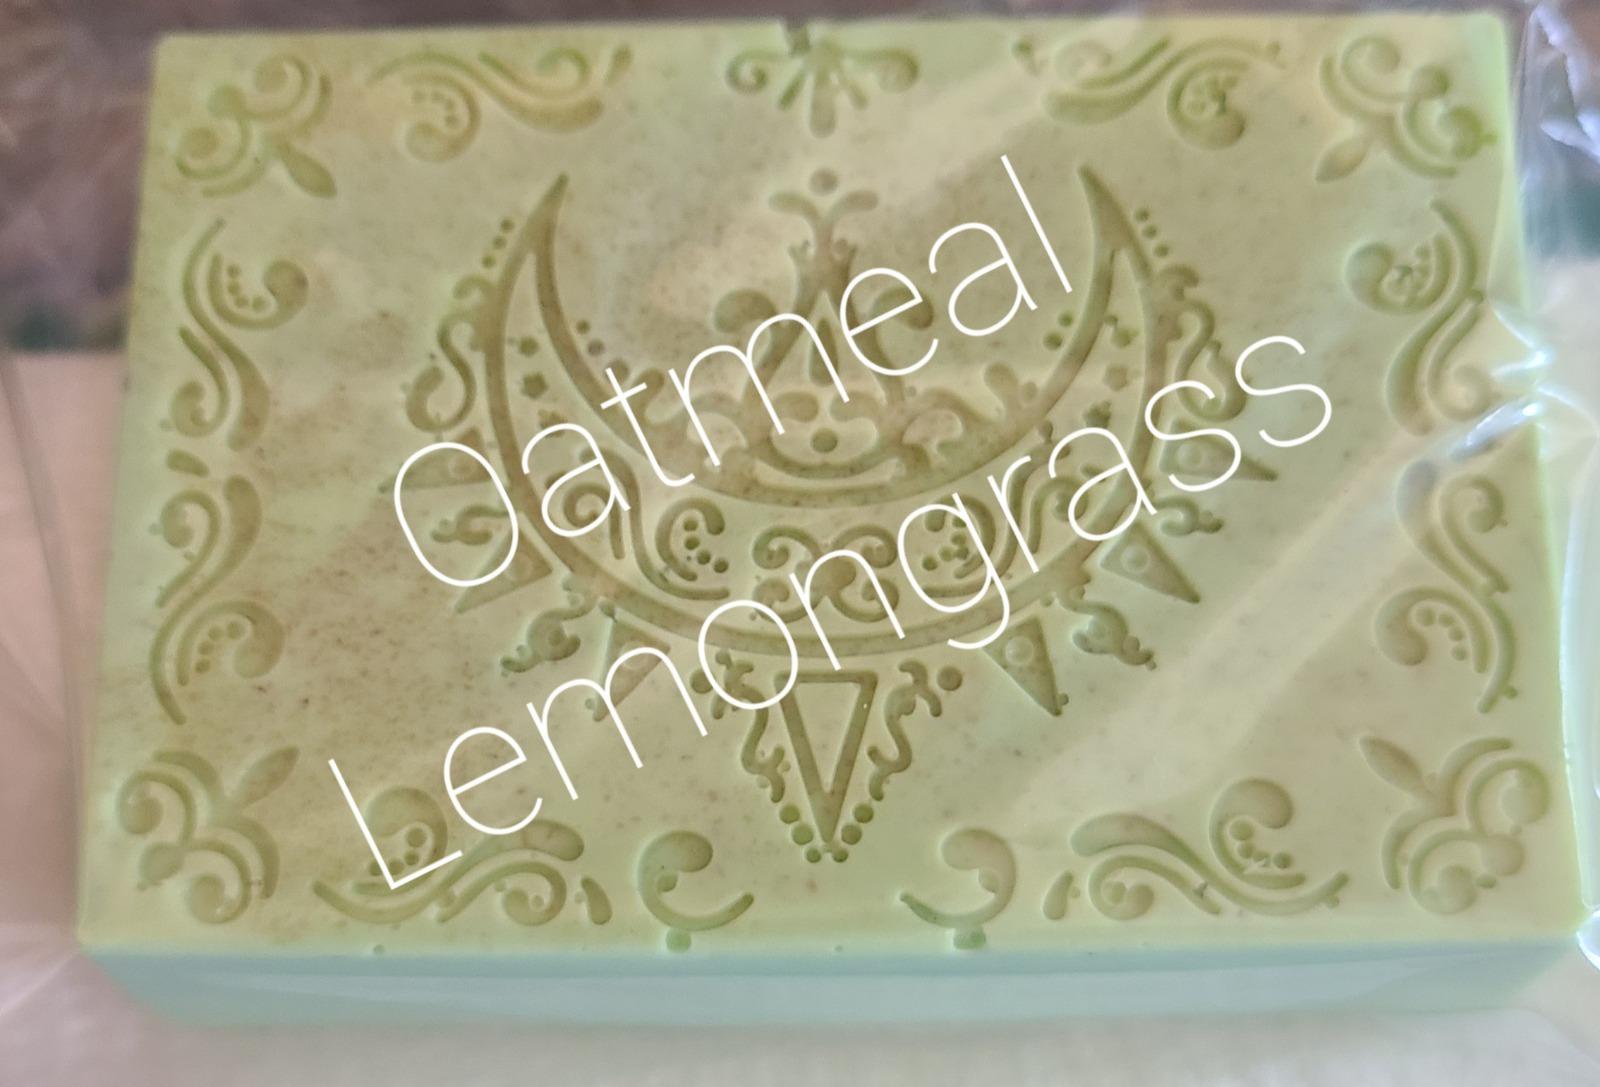 Oatmeal Bar Soap